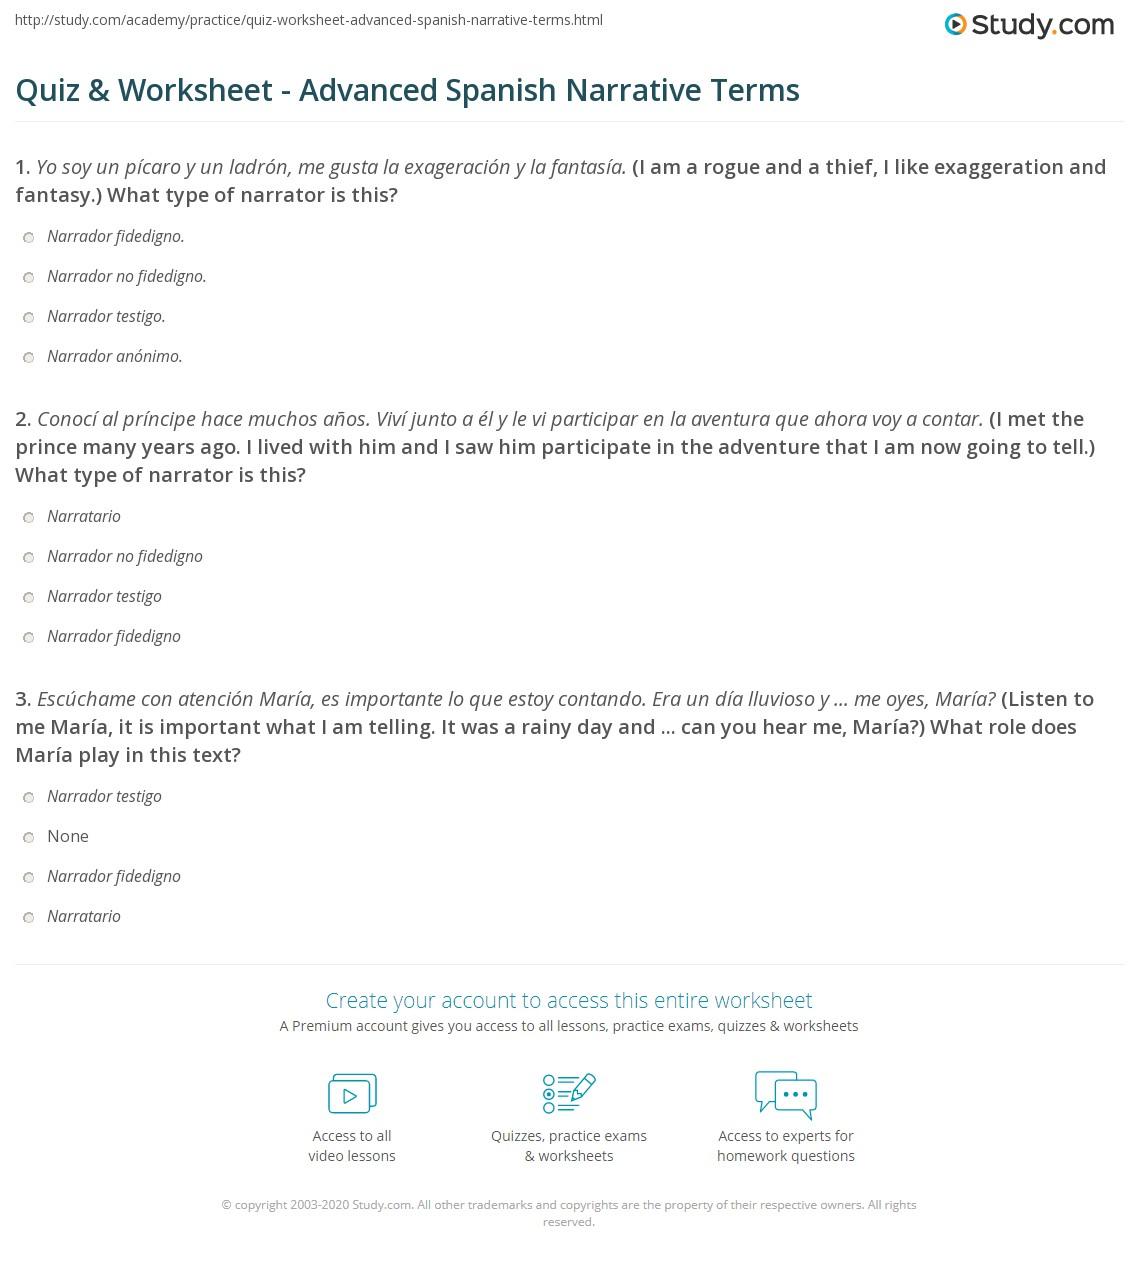 Quiz Worksheet Advanced Spanish Narrative Terms Study